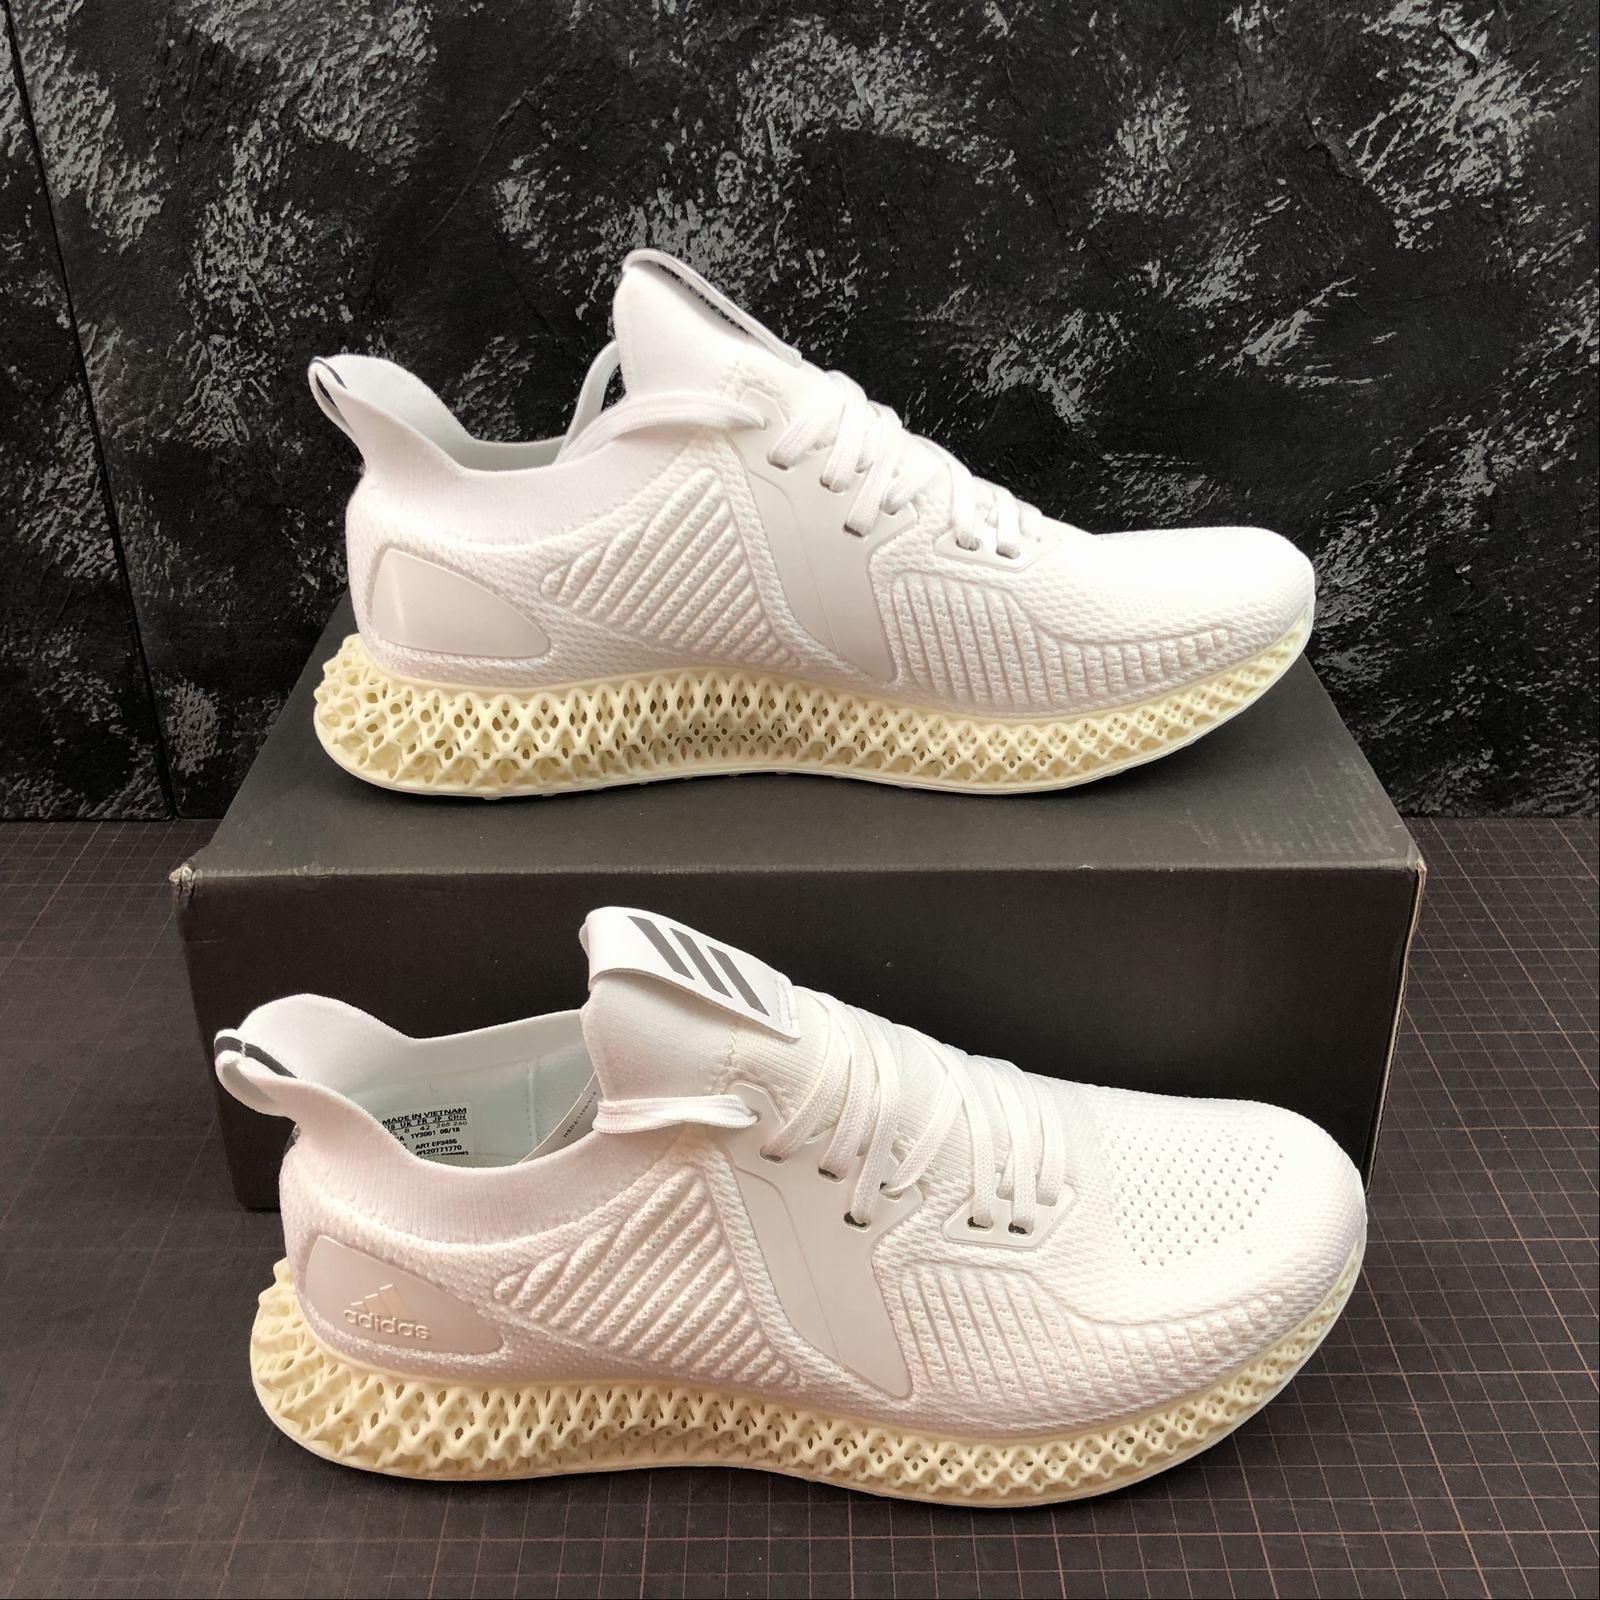 giay-sneaker-adidas-futurecraft-4d-ef3455